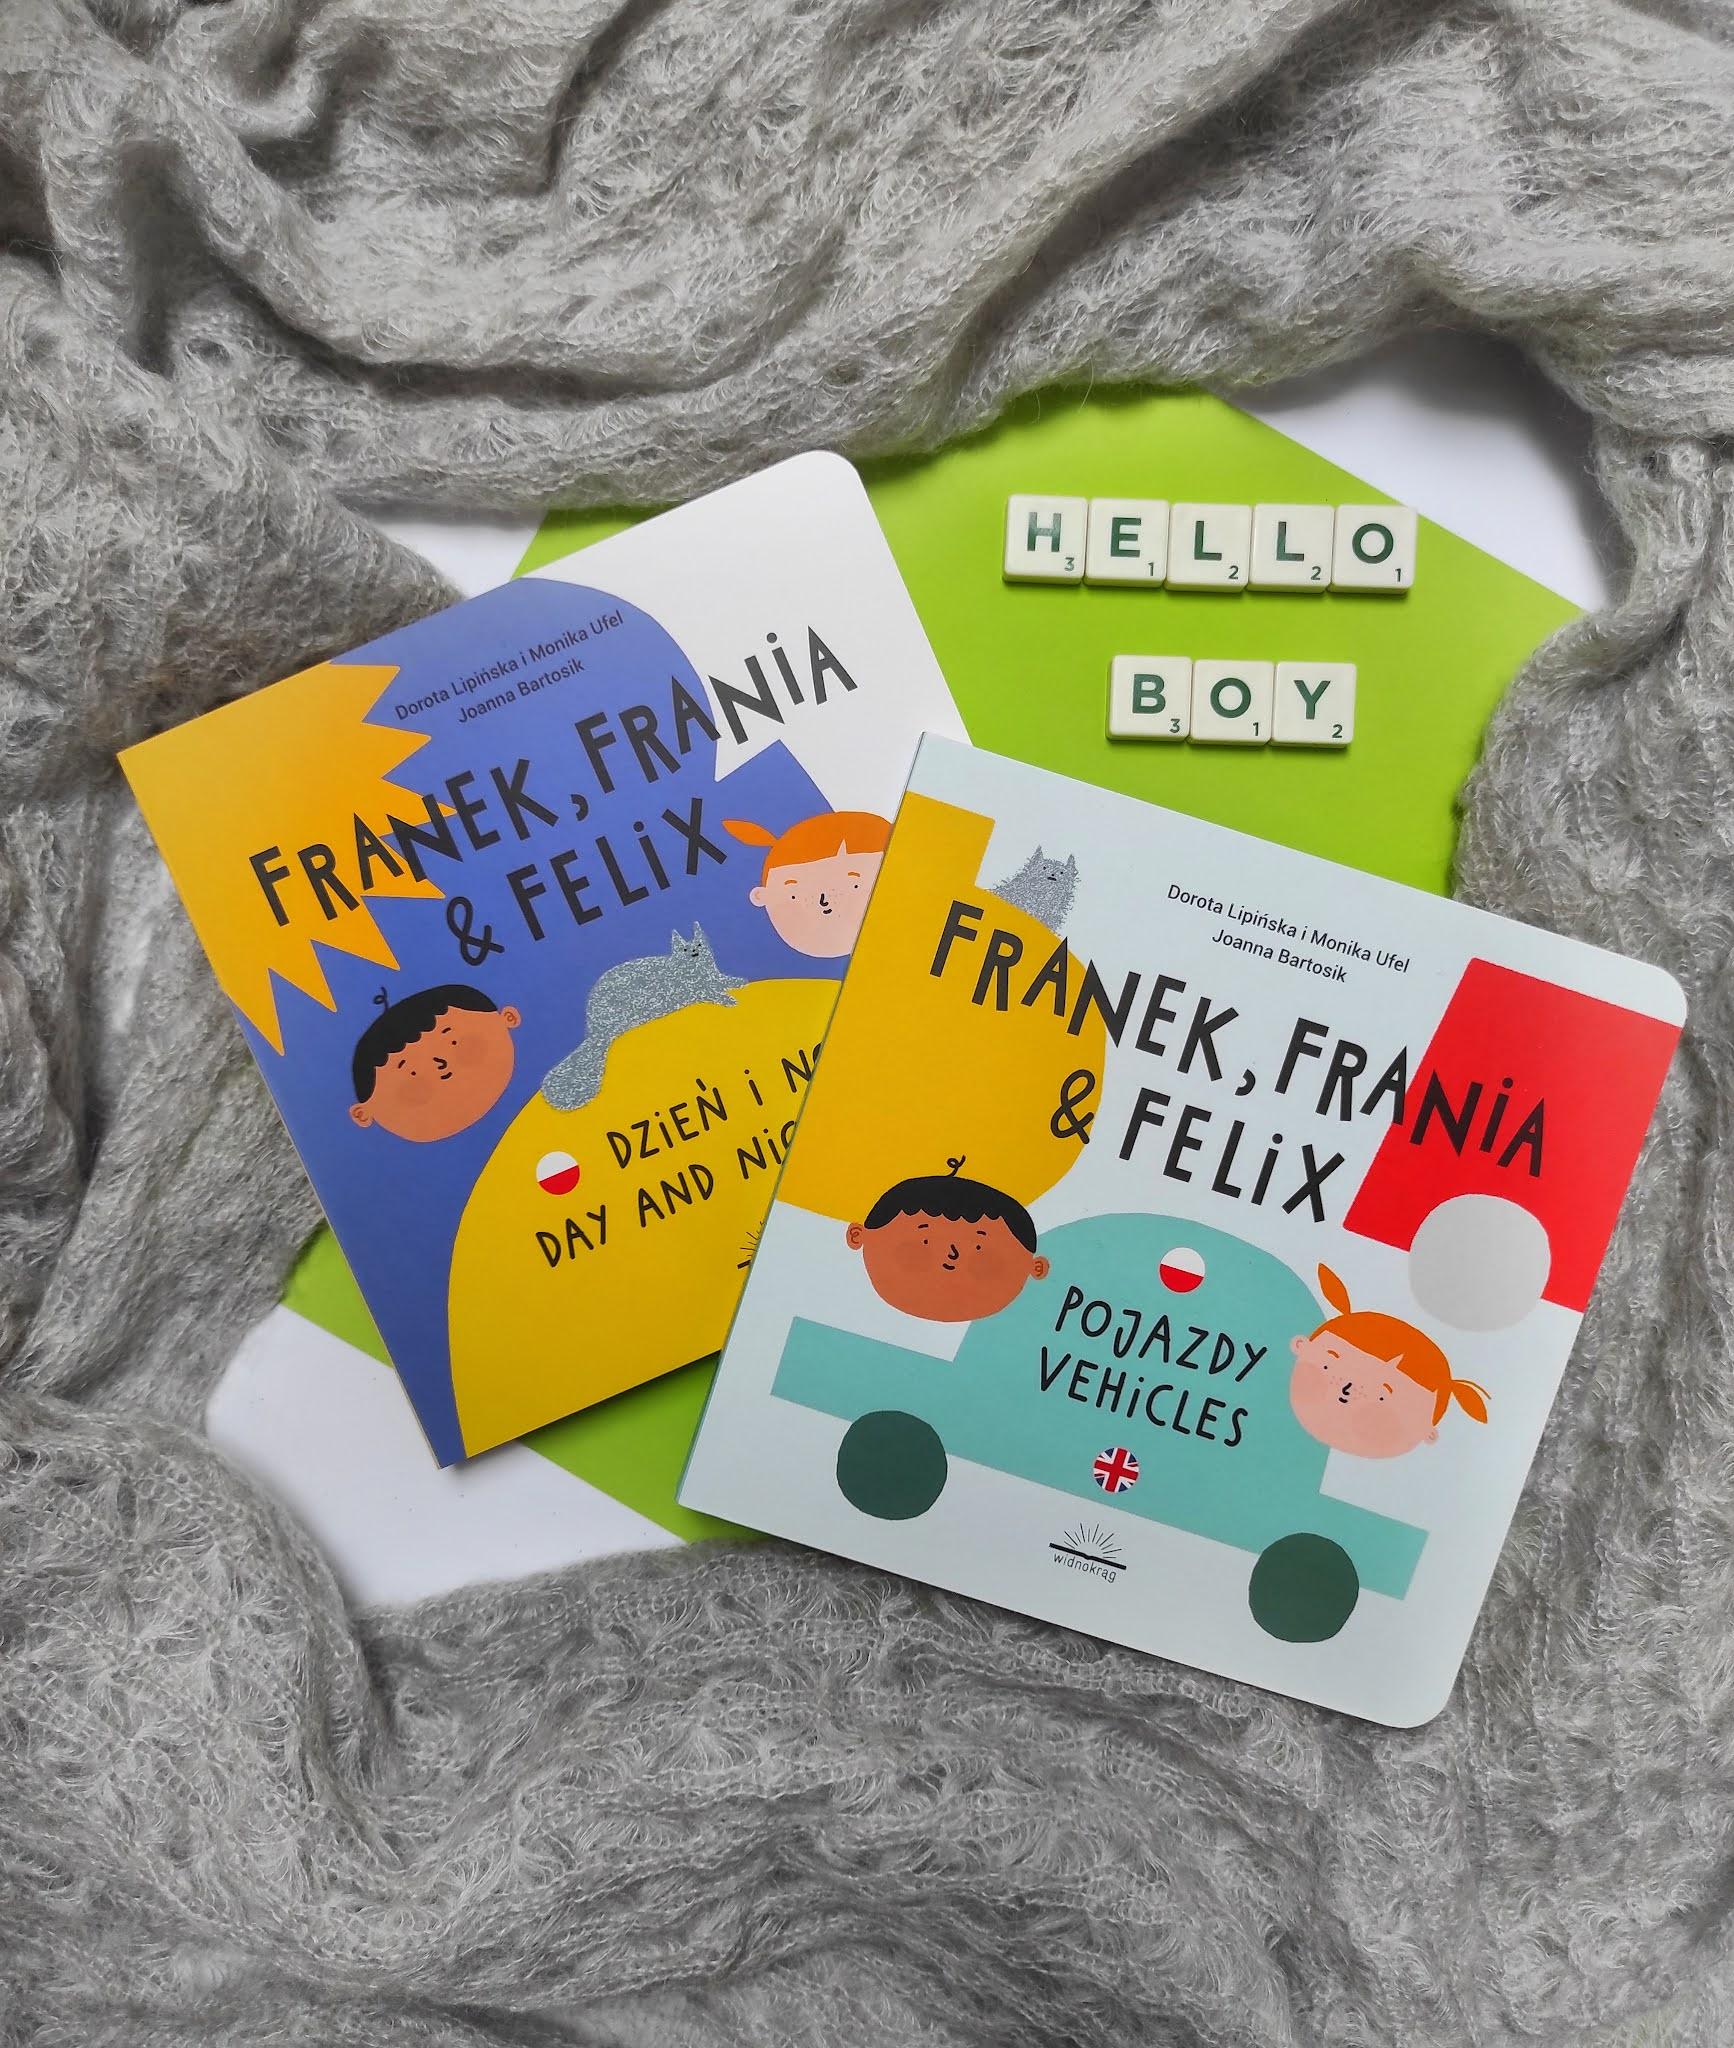 "Franek, Frania & Felix ""Pojazdy"" ""Dzień i noc"" Dorota Lipińska, Monika Ufel, Joanna Bartosik"